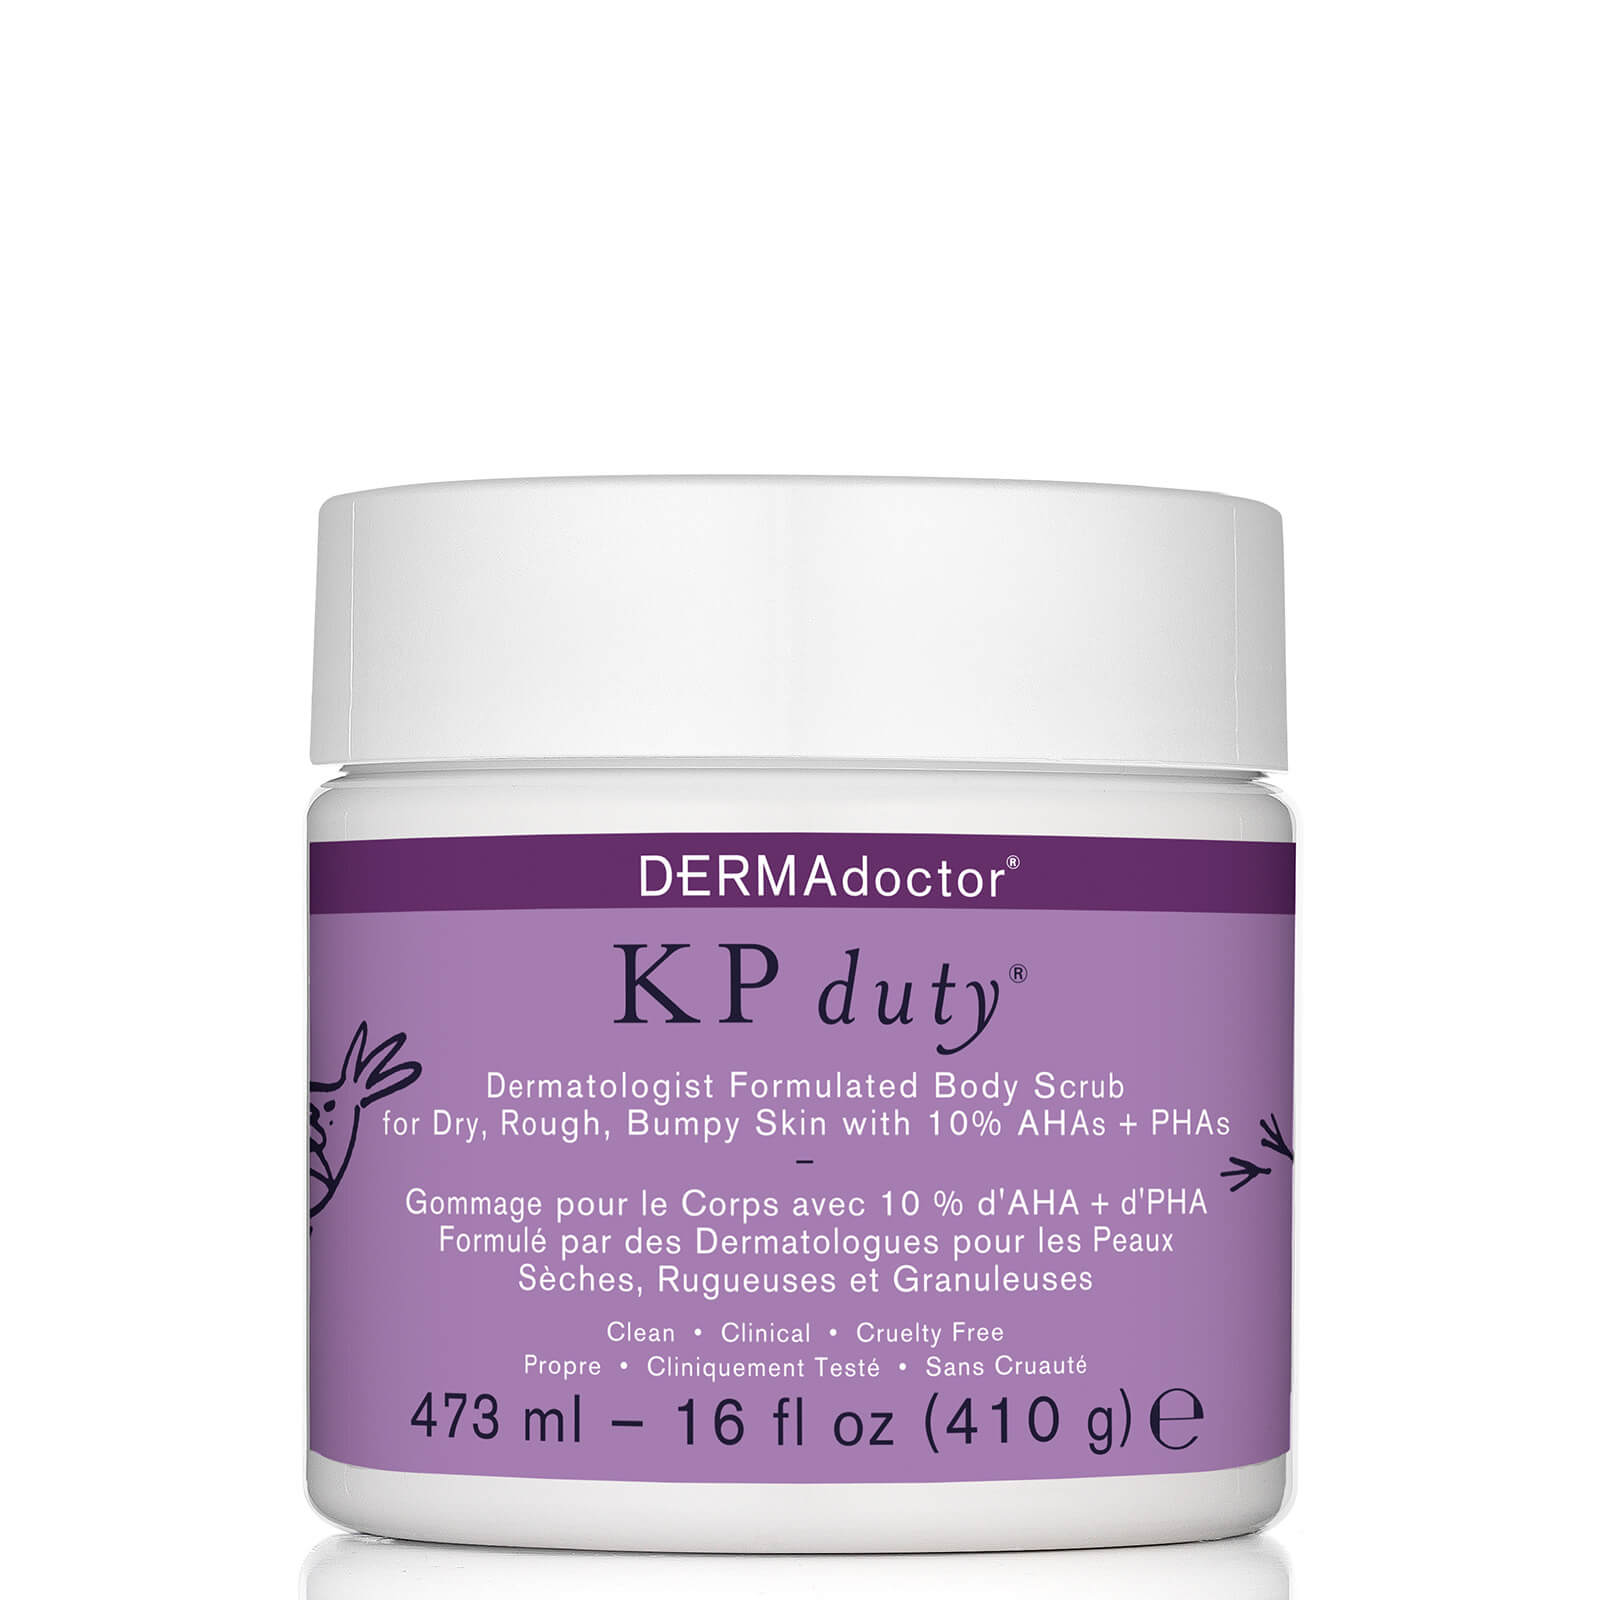 Купить DERMAdoctor KP Duty Dermatologist Formulated Body Scrub (Various Sizes) - 16 oz